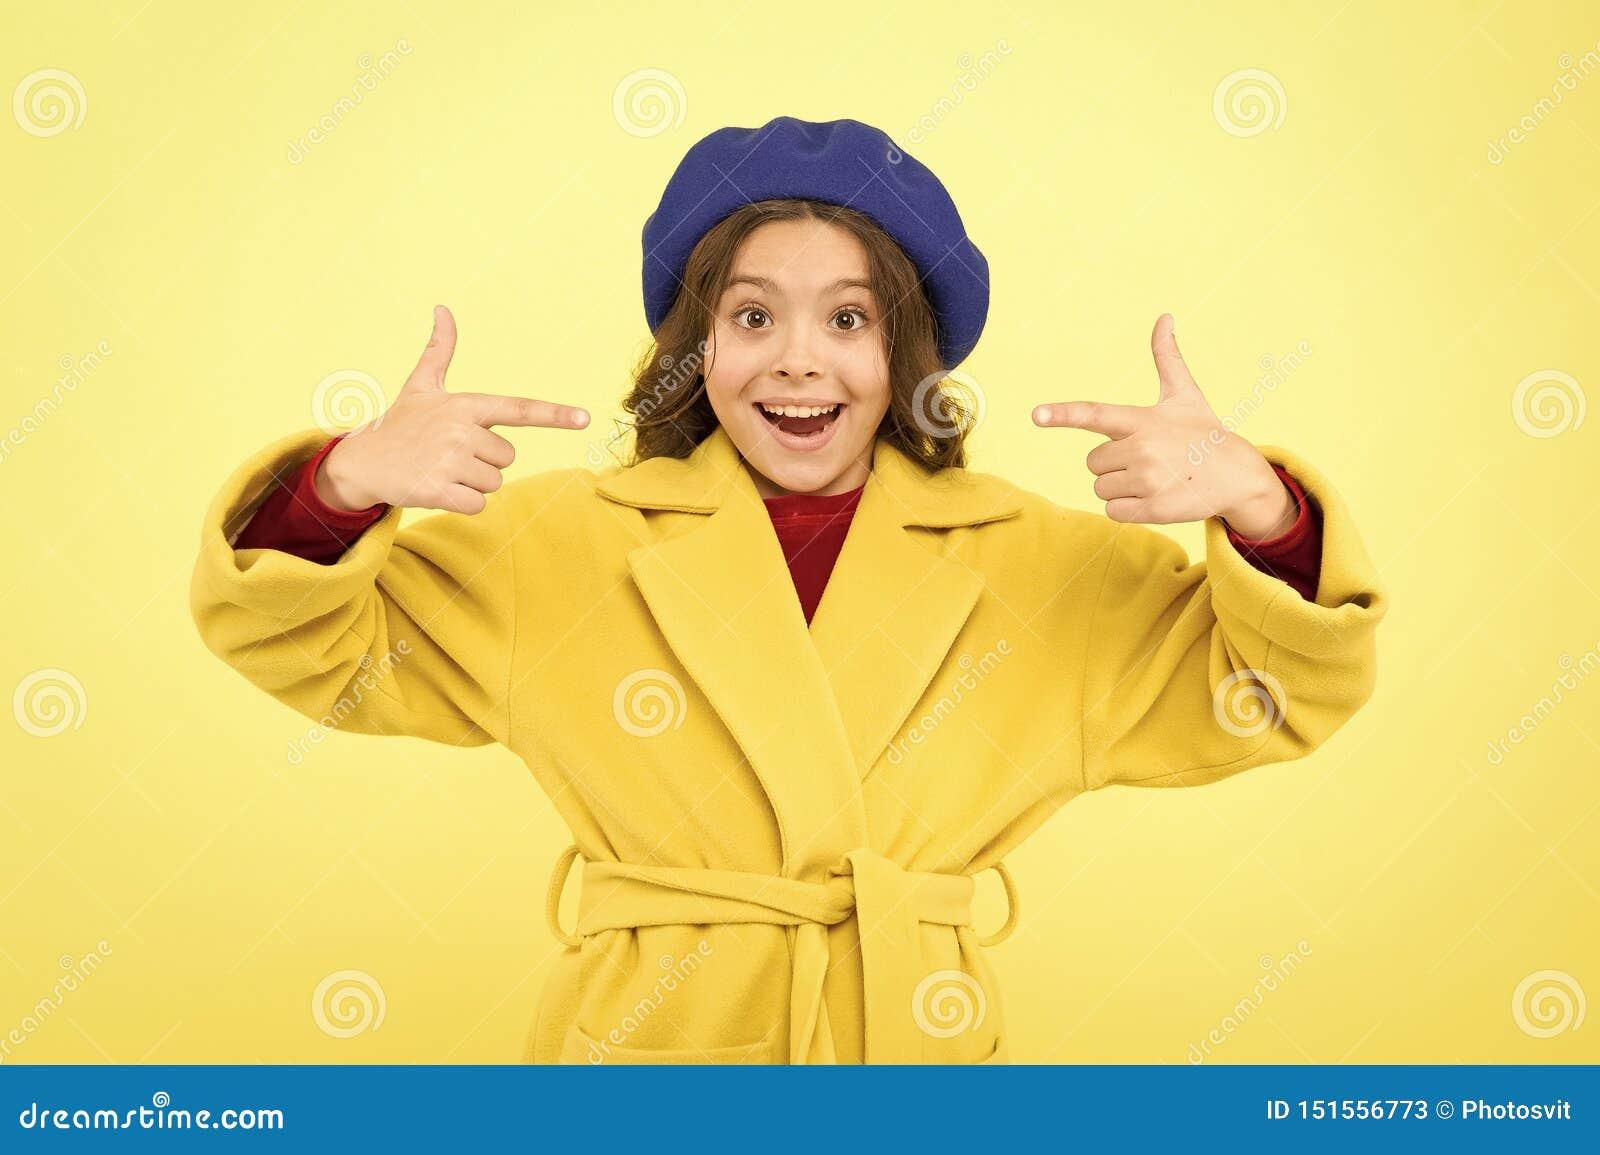 R παιδική ηλικία και ευτυχία r γαλλικό beret ύφους παρισινό κορίτσι μικρό παιδί στο Παρίσι r